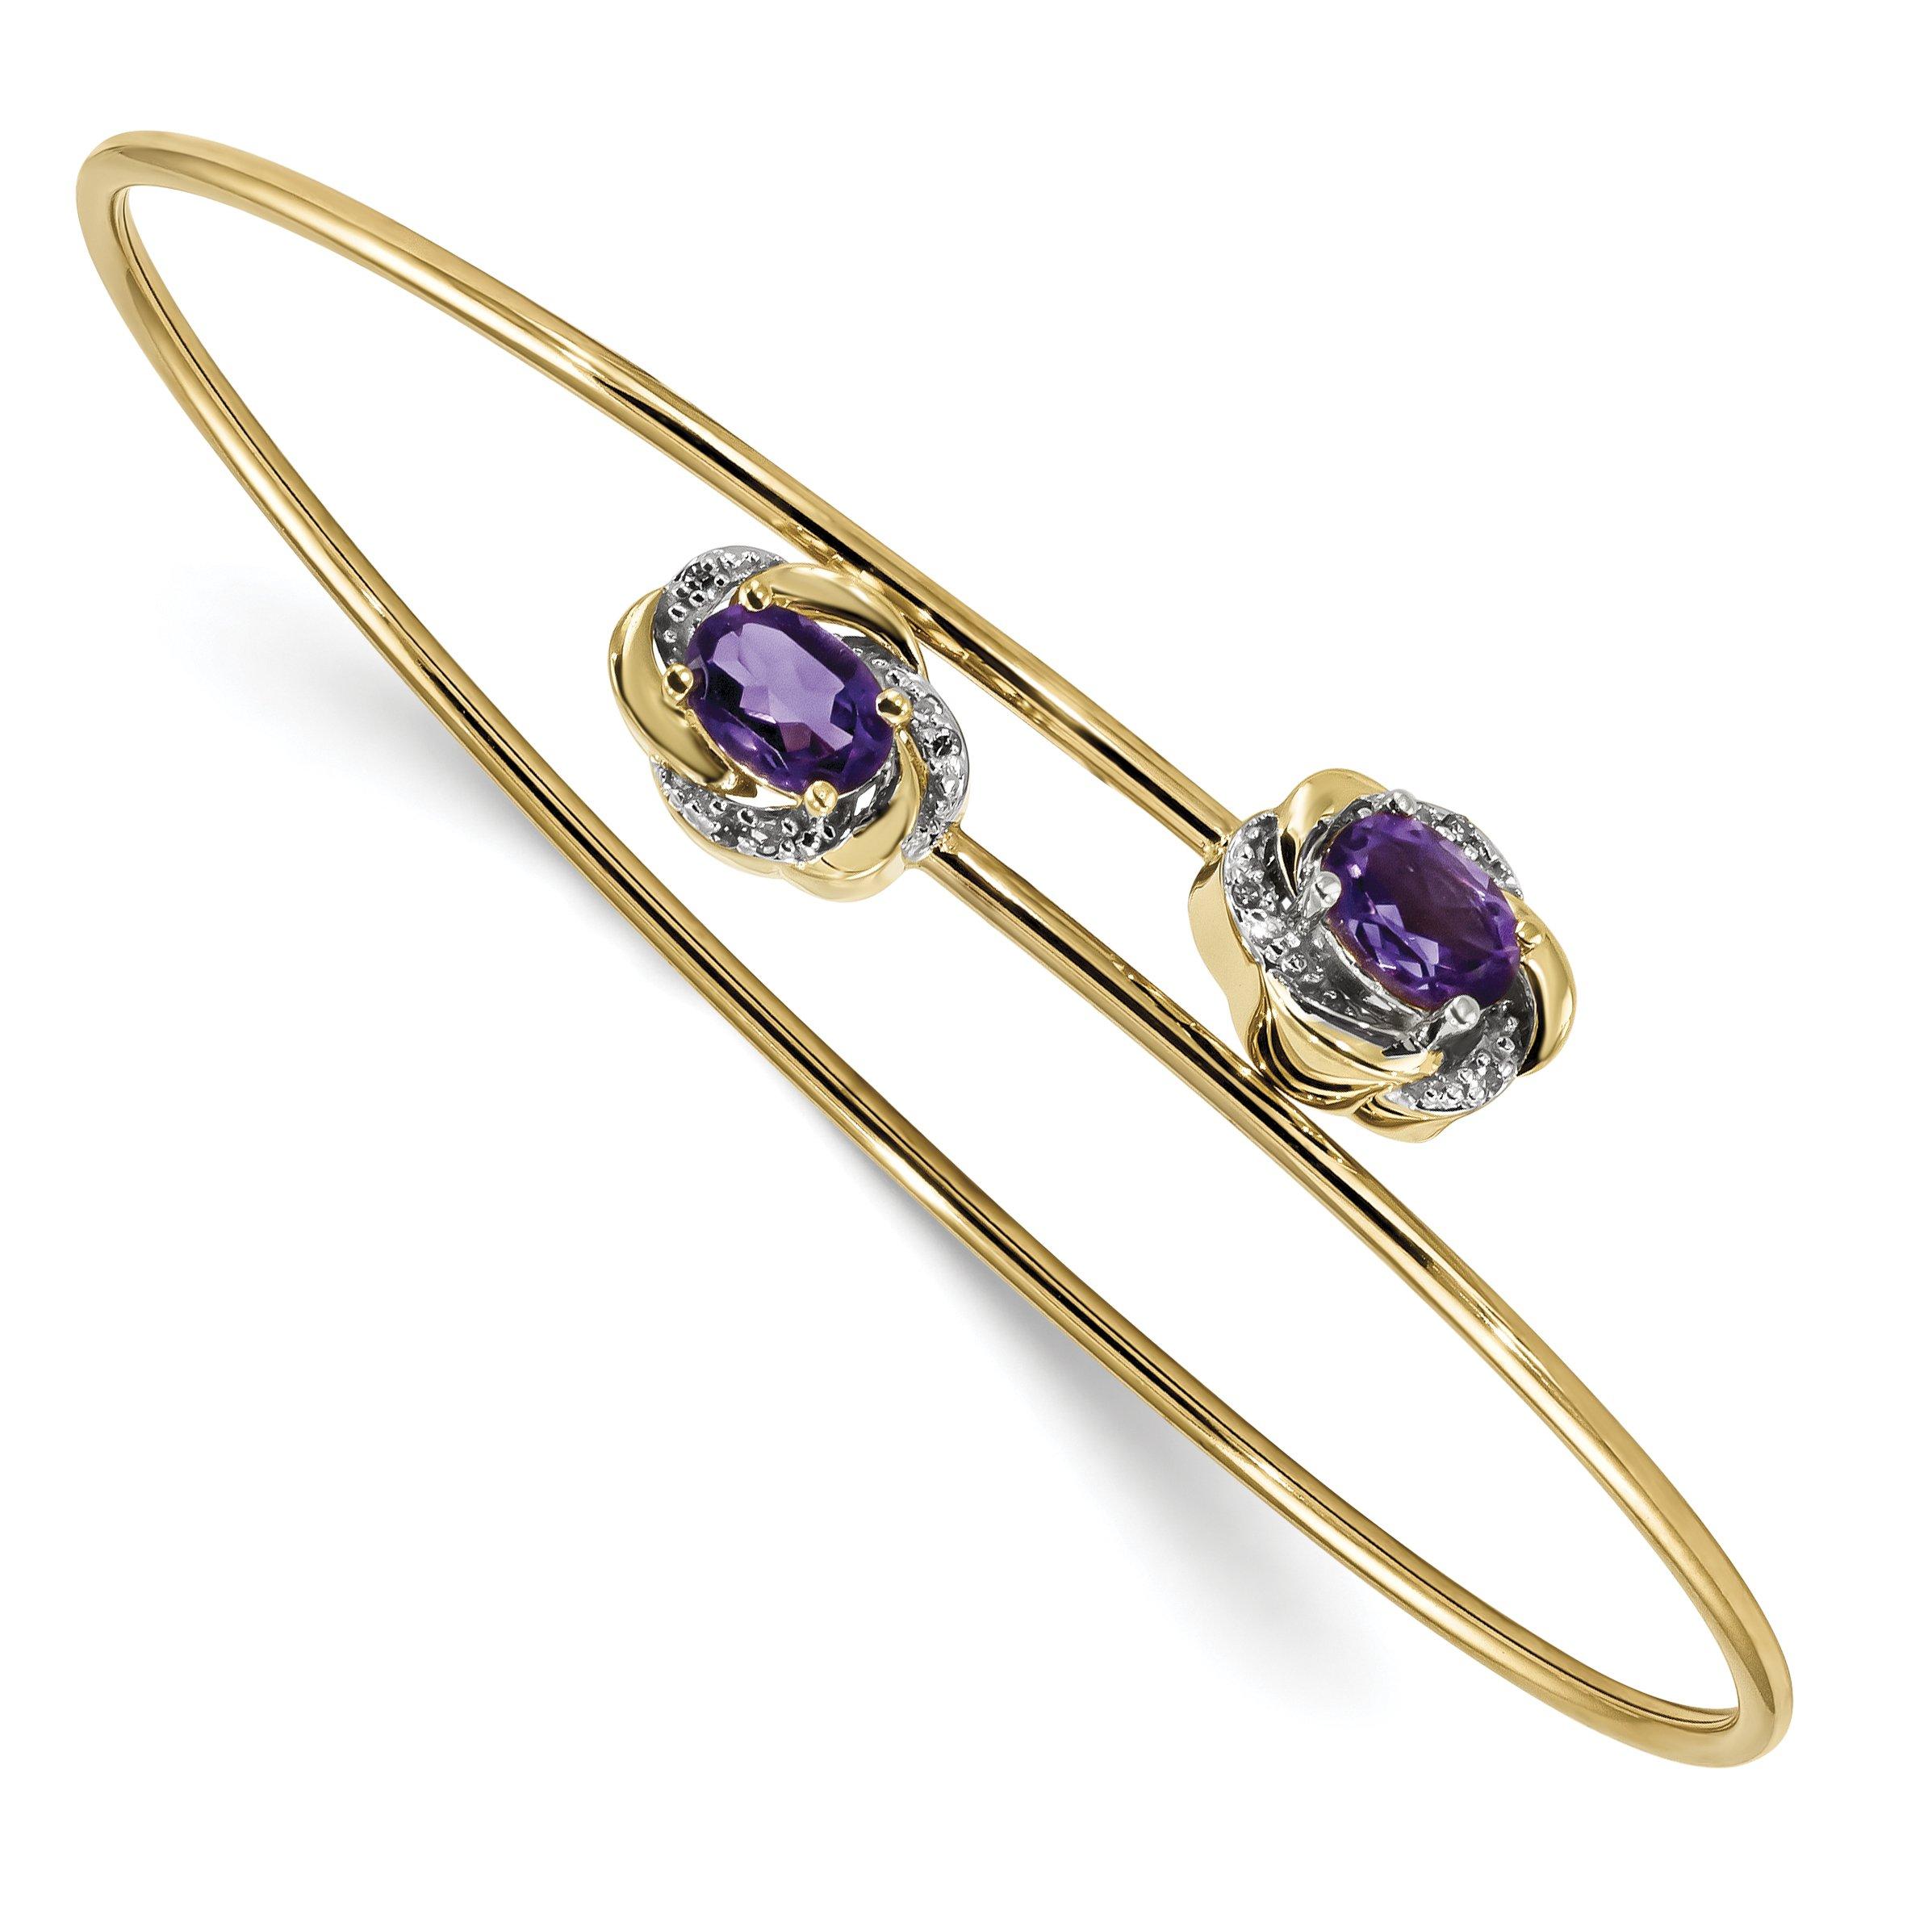 ICE CARATS 14k Yellow Gold 0.03ct Diamond .86ct Purple Amethyst Flexible Bangle Bracelet Cuff Expandable Stackable Gemstone Fine Jewelry Gift Set For Women Heart